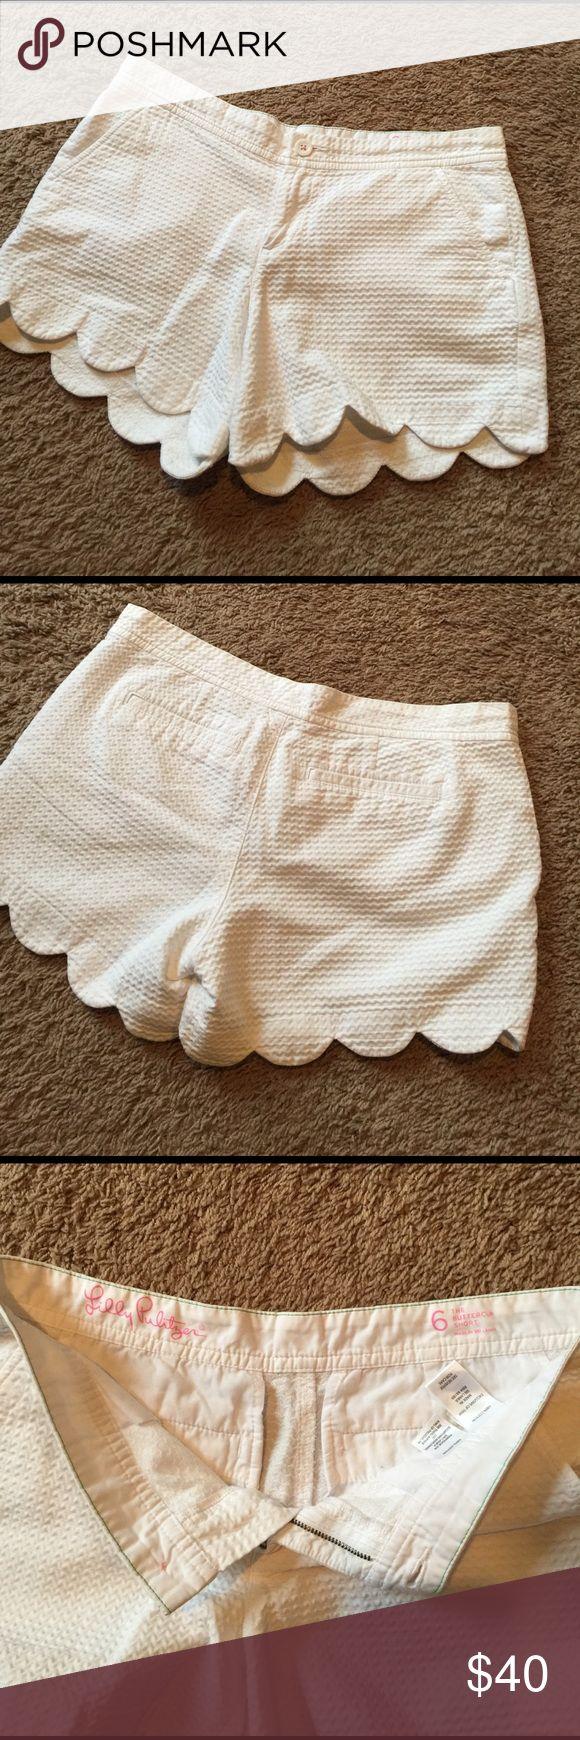 White Lilly Pulitzer Buttercup Shorts. Sz 6. EUC. White Lilly Pulitzer Buttercup Shorts. Sz 6. EUC. Lilly Pulitzer Shorts